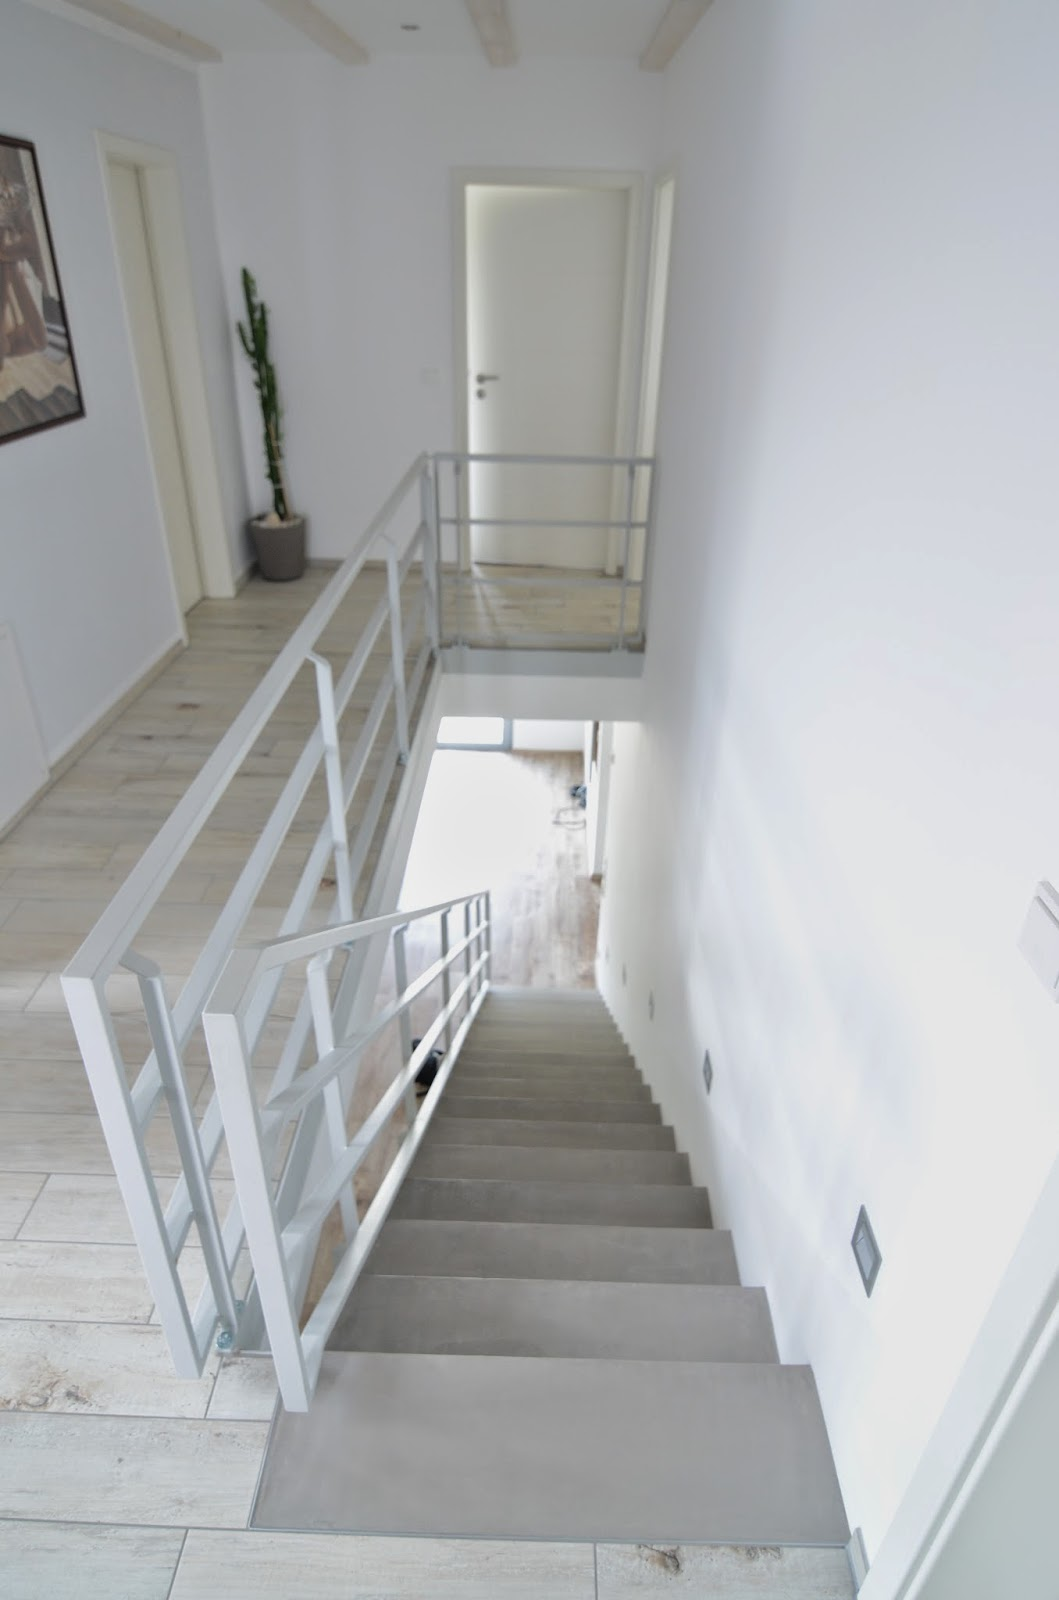 beton cire oberfl chen in beton look betontreppe l beton cire l treppenbeschichtung in betonoptik. Black Bedroom Furniture Sets. Home Design Ideas